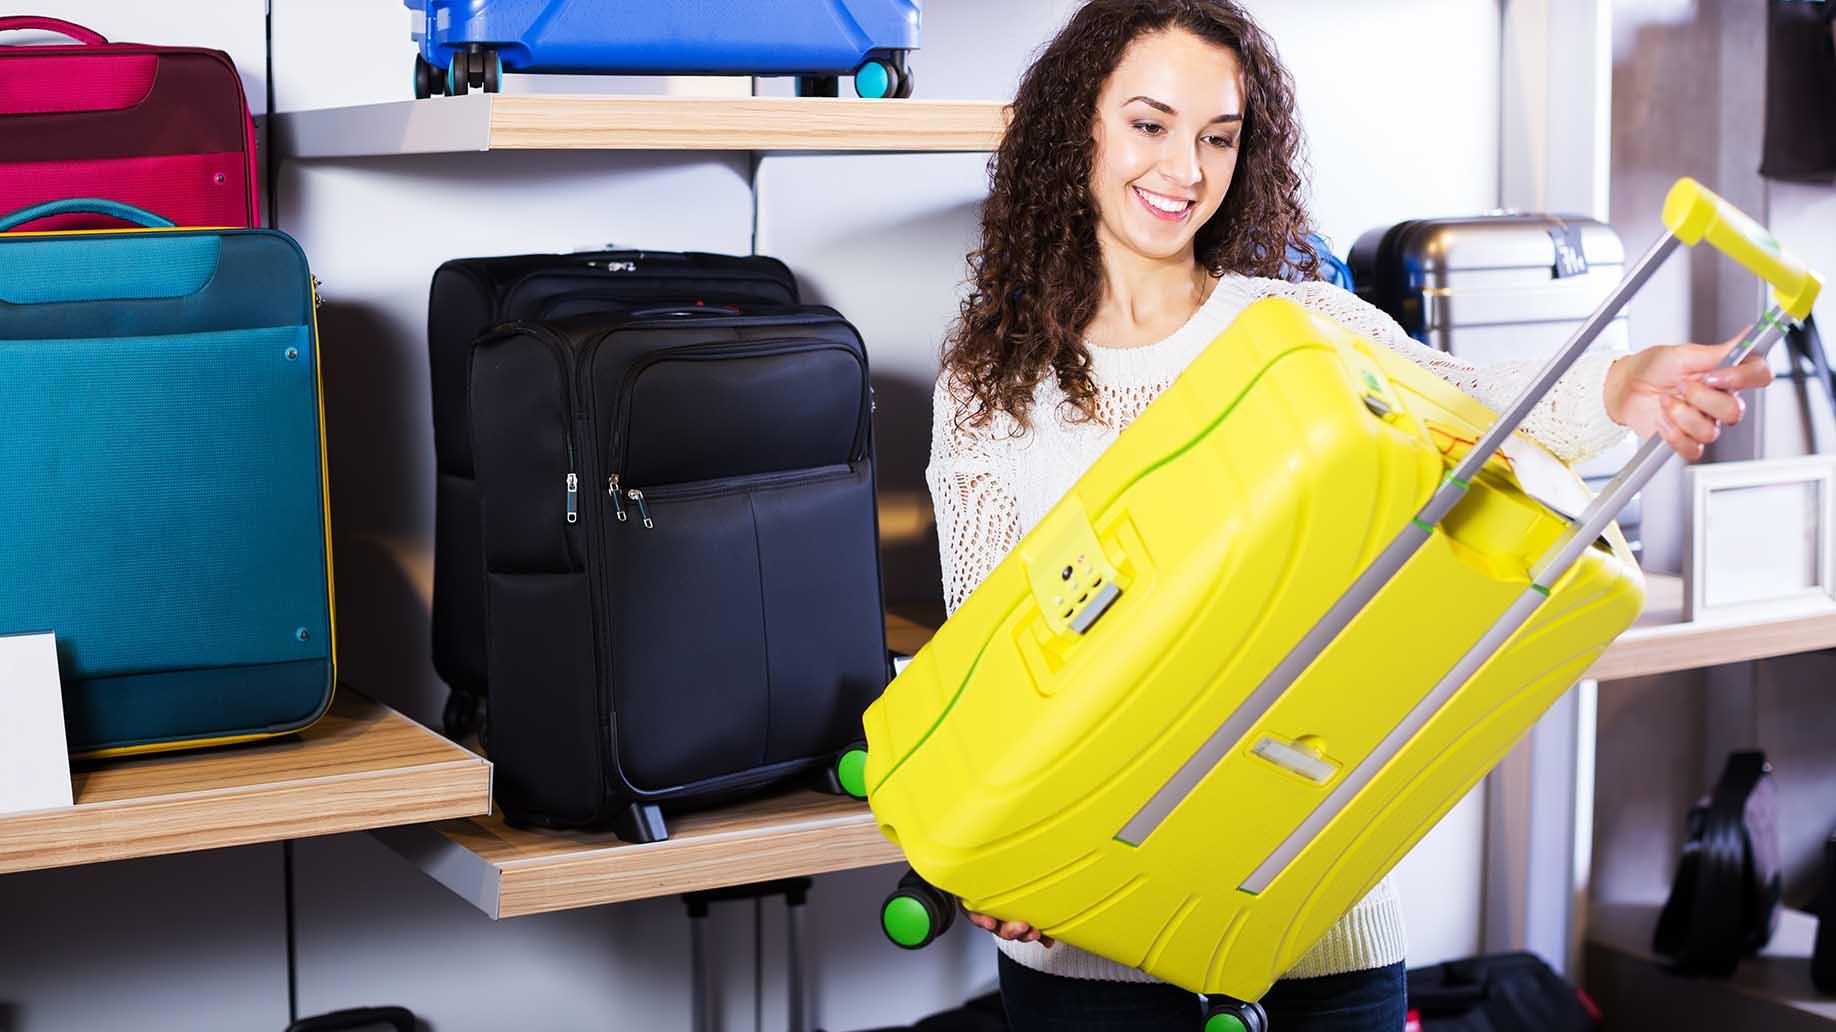 Upgrade your luggage